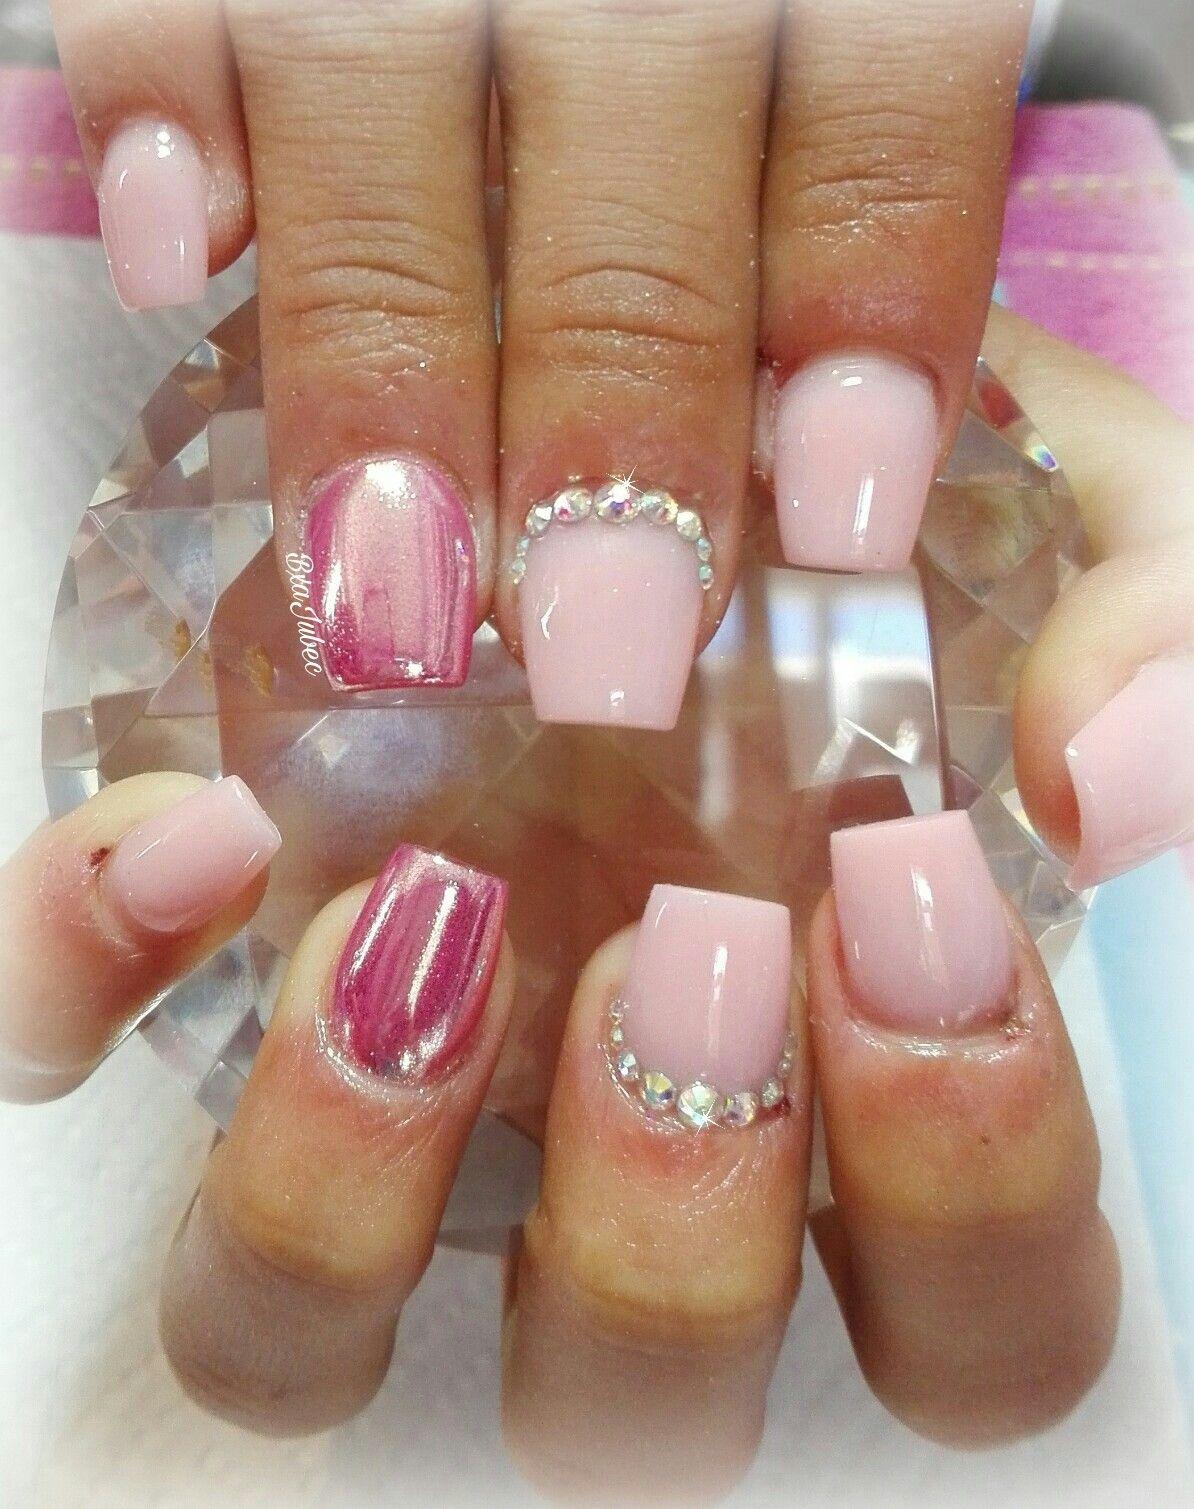 Uñas efecto espejo rosa Uñas pequeñas | uñas Betsa Jubec | Pinterest ...